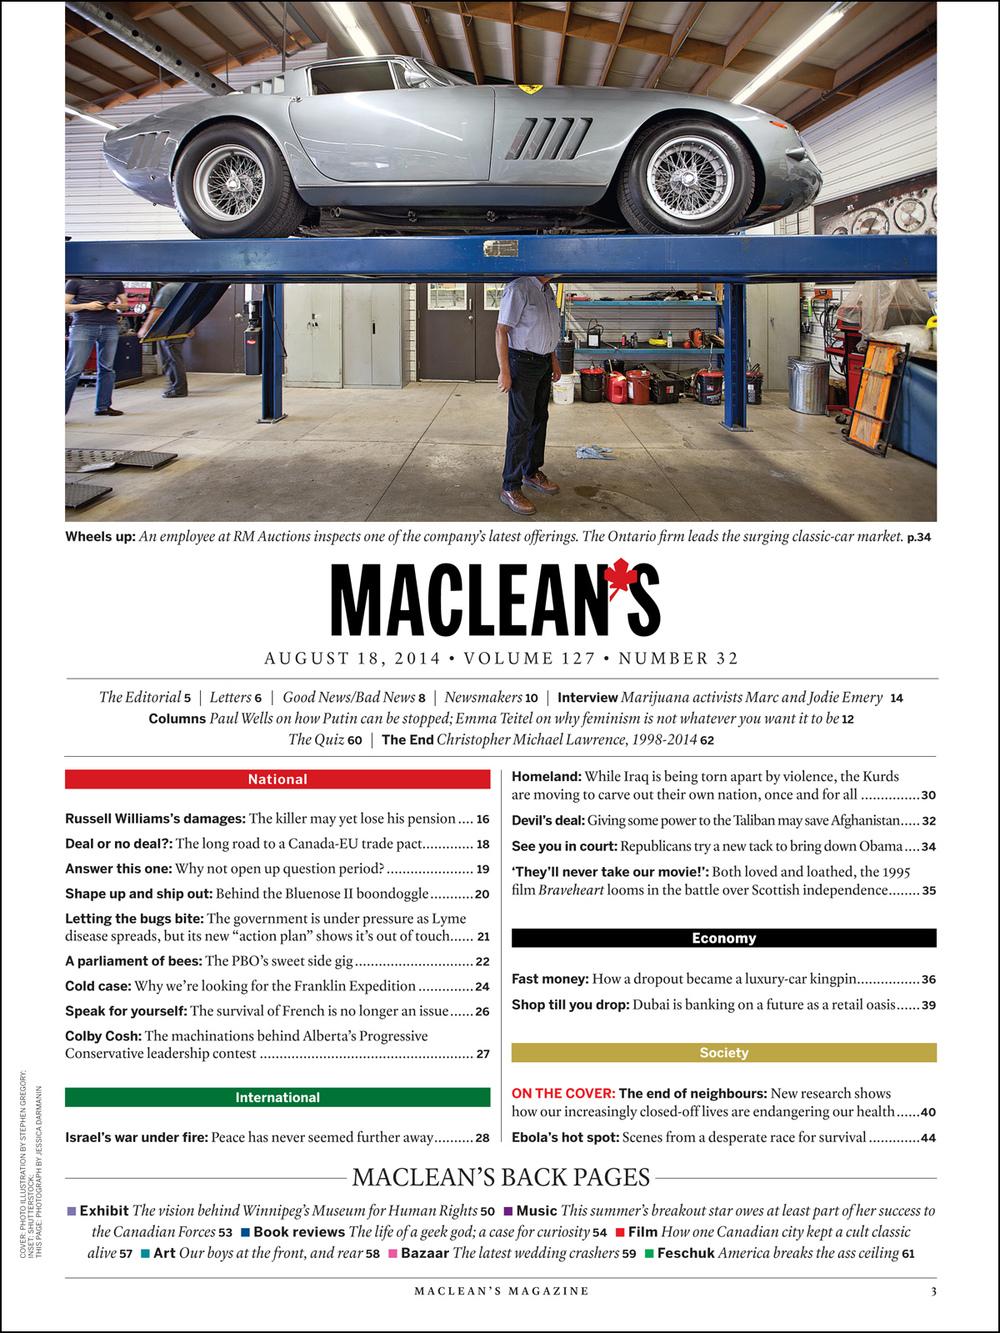 Maclean's magazine